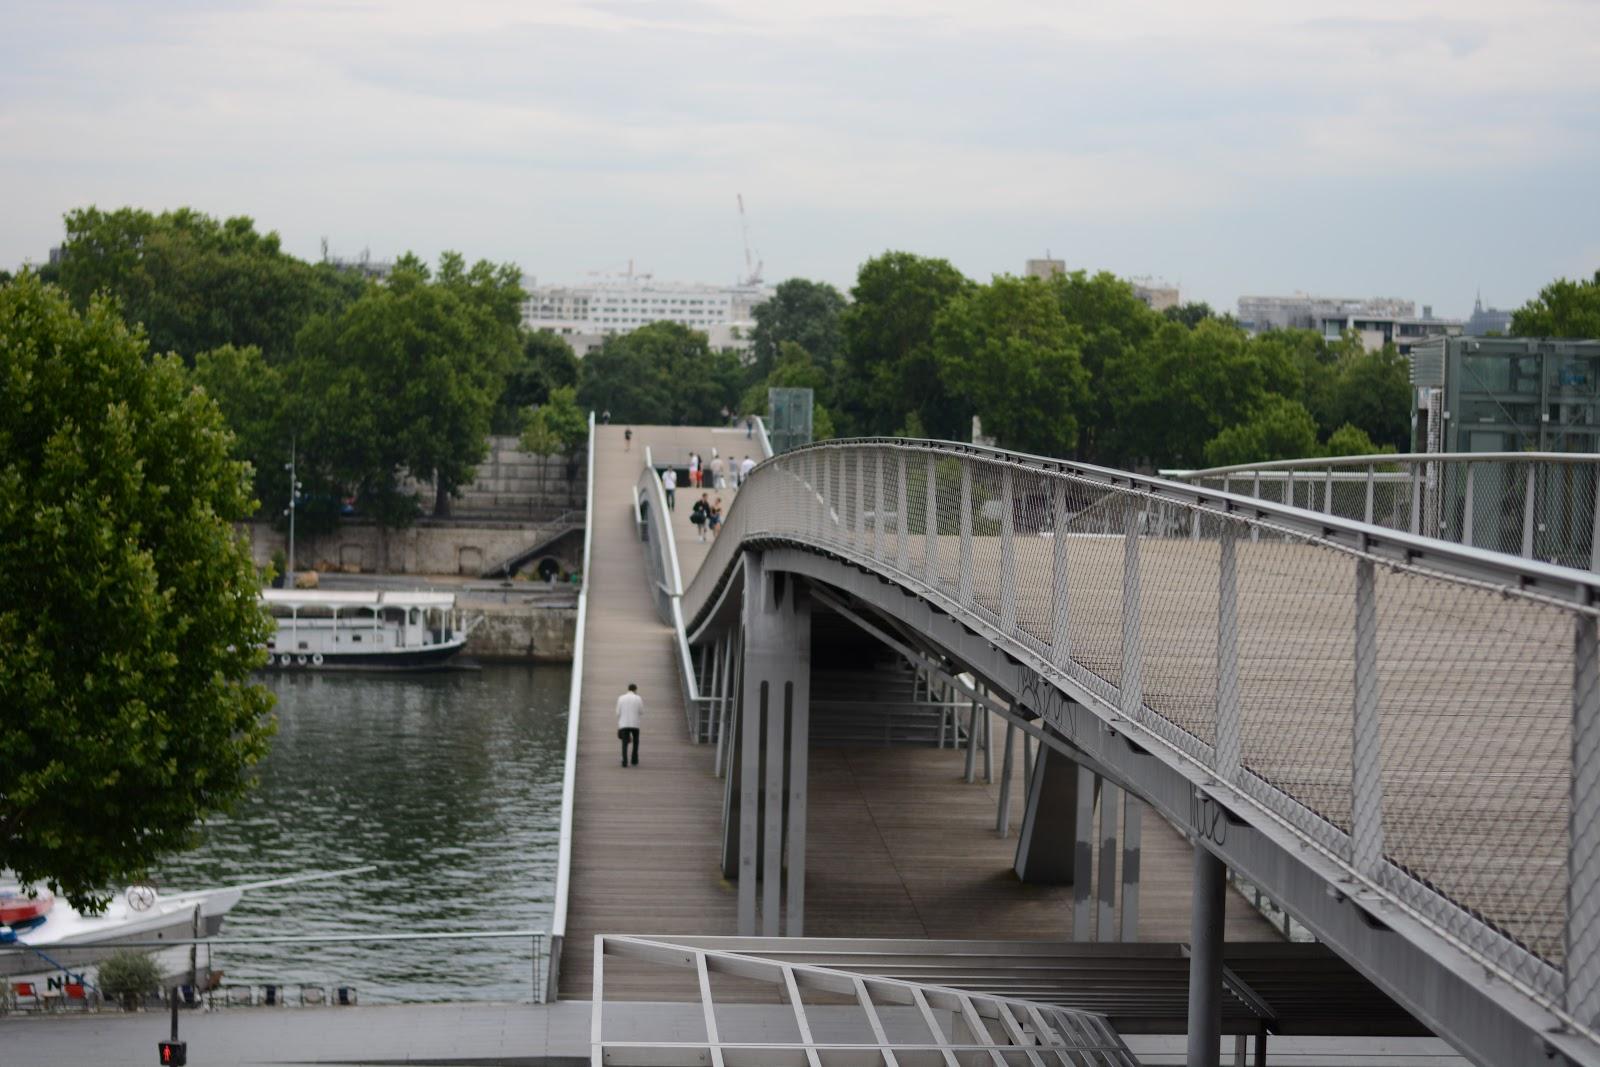 bibliotheque-françois-mitterand-bnf-paris-metro-14-theoctober21